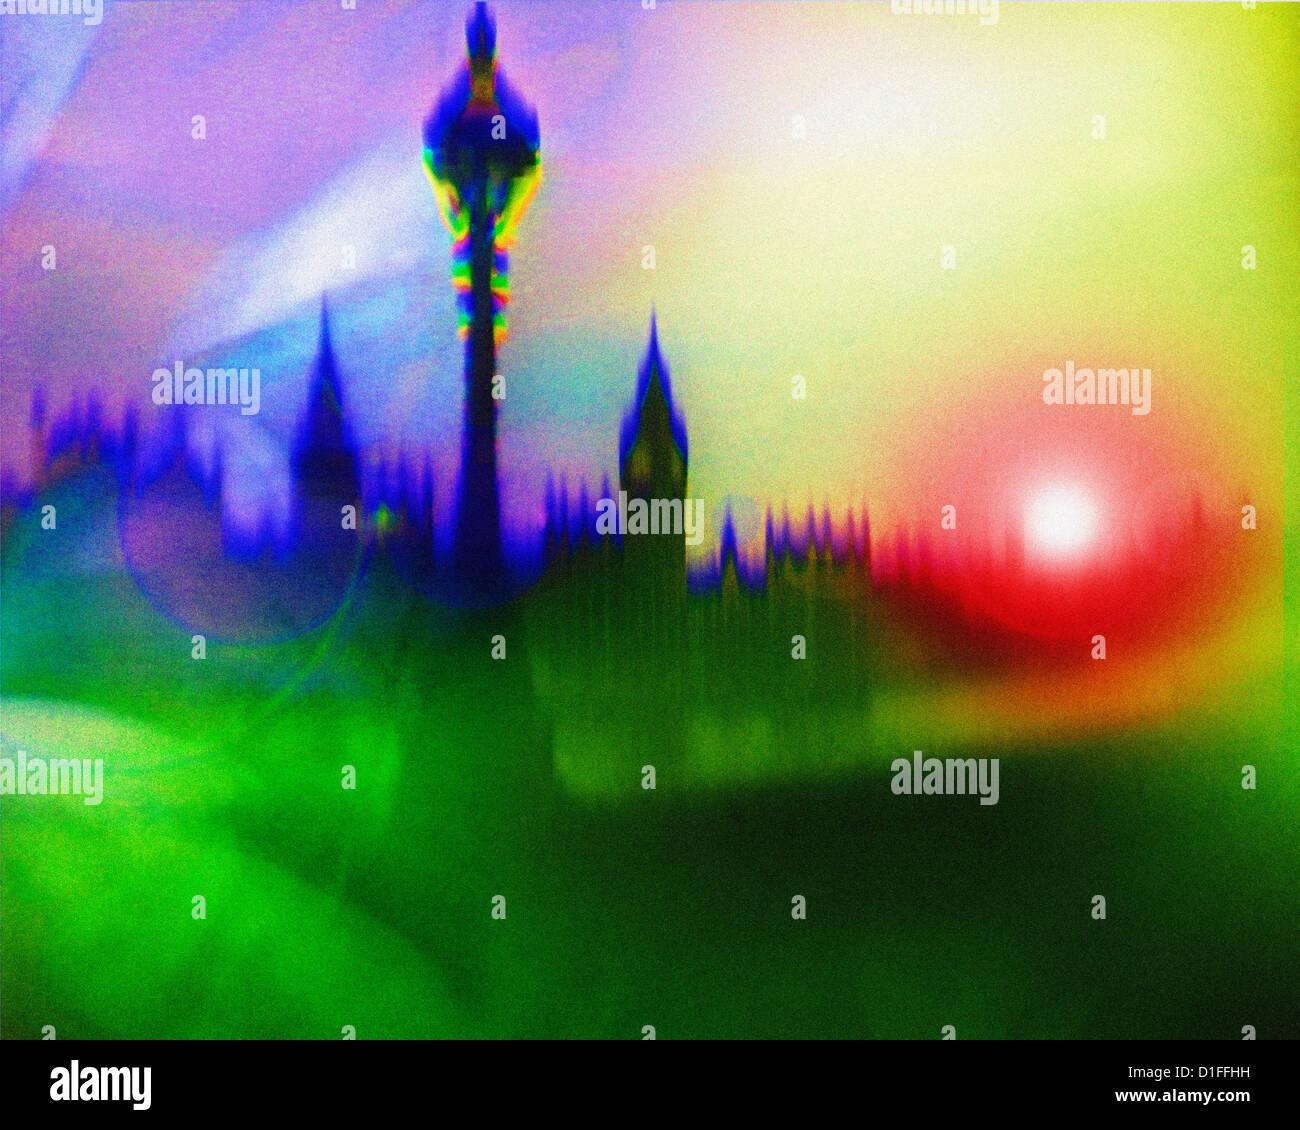 DIGITAL ART: London - Stock Image